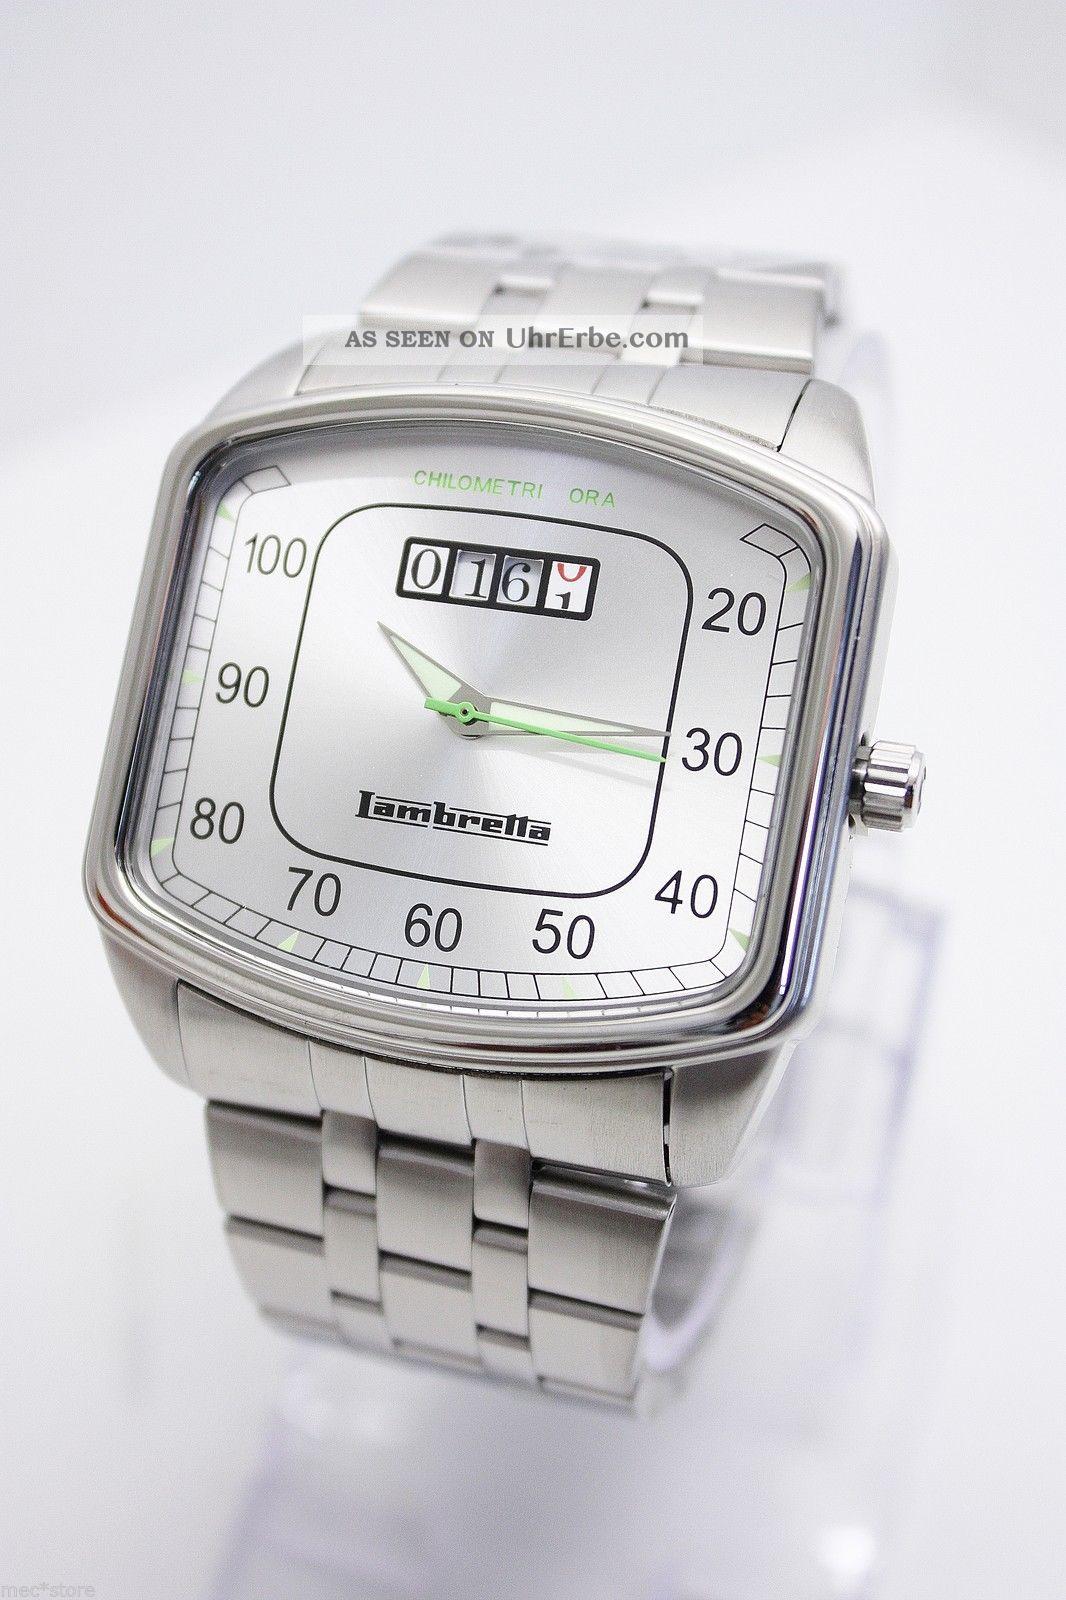 Lambretta He - Uhr - Chilometri Ora - Silber Armbanduhren Bild